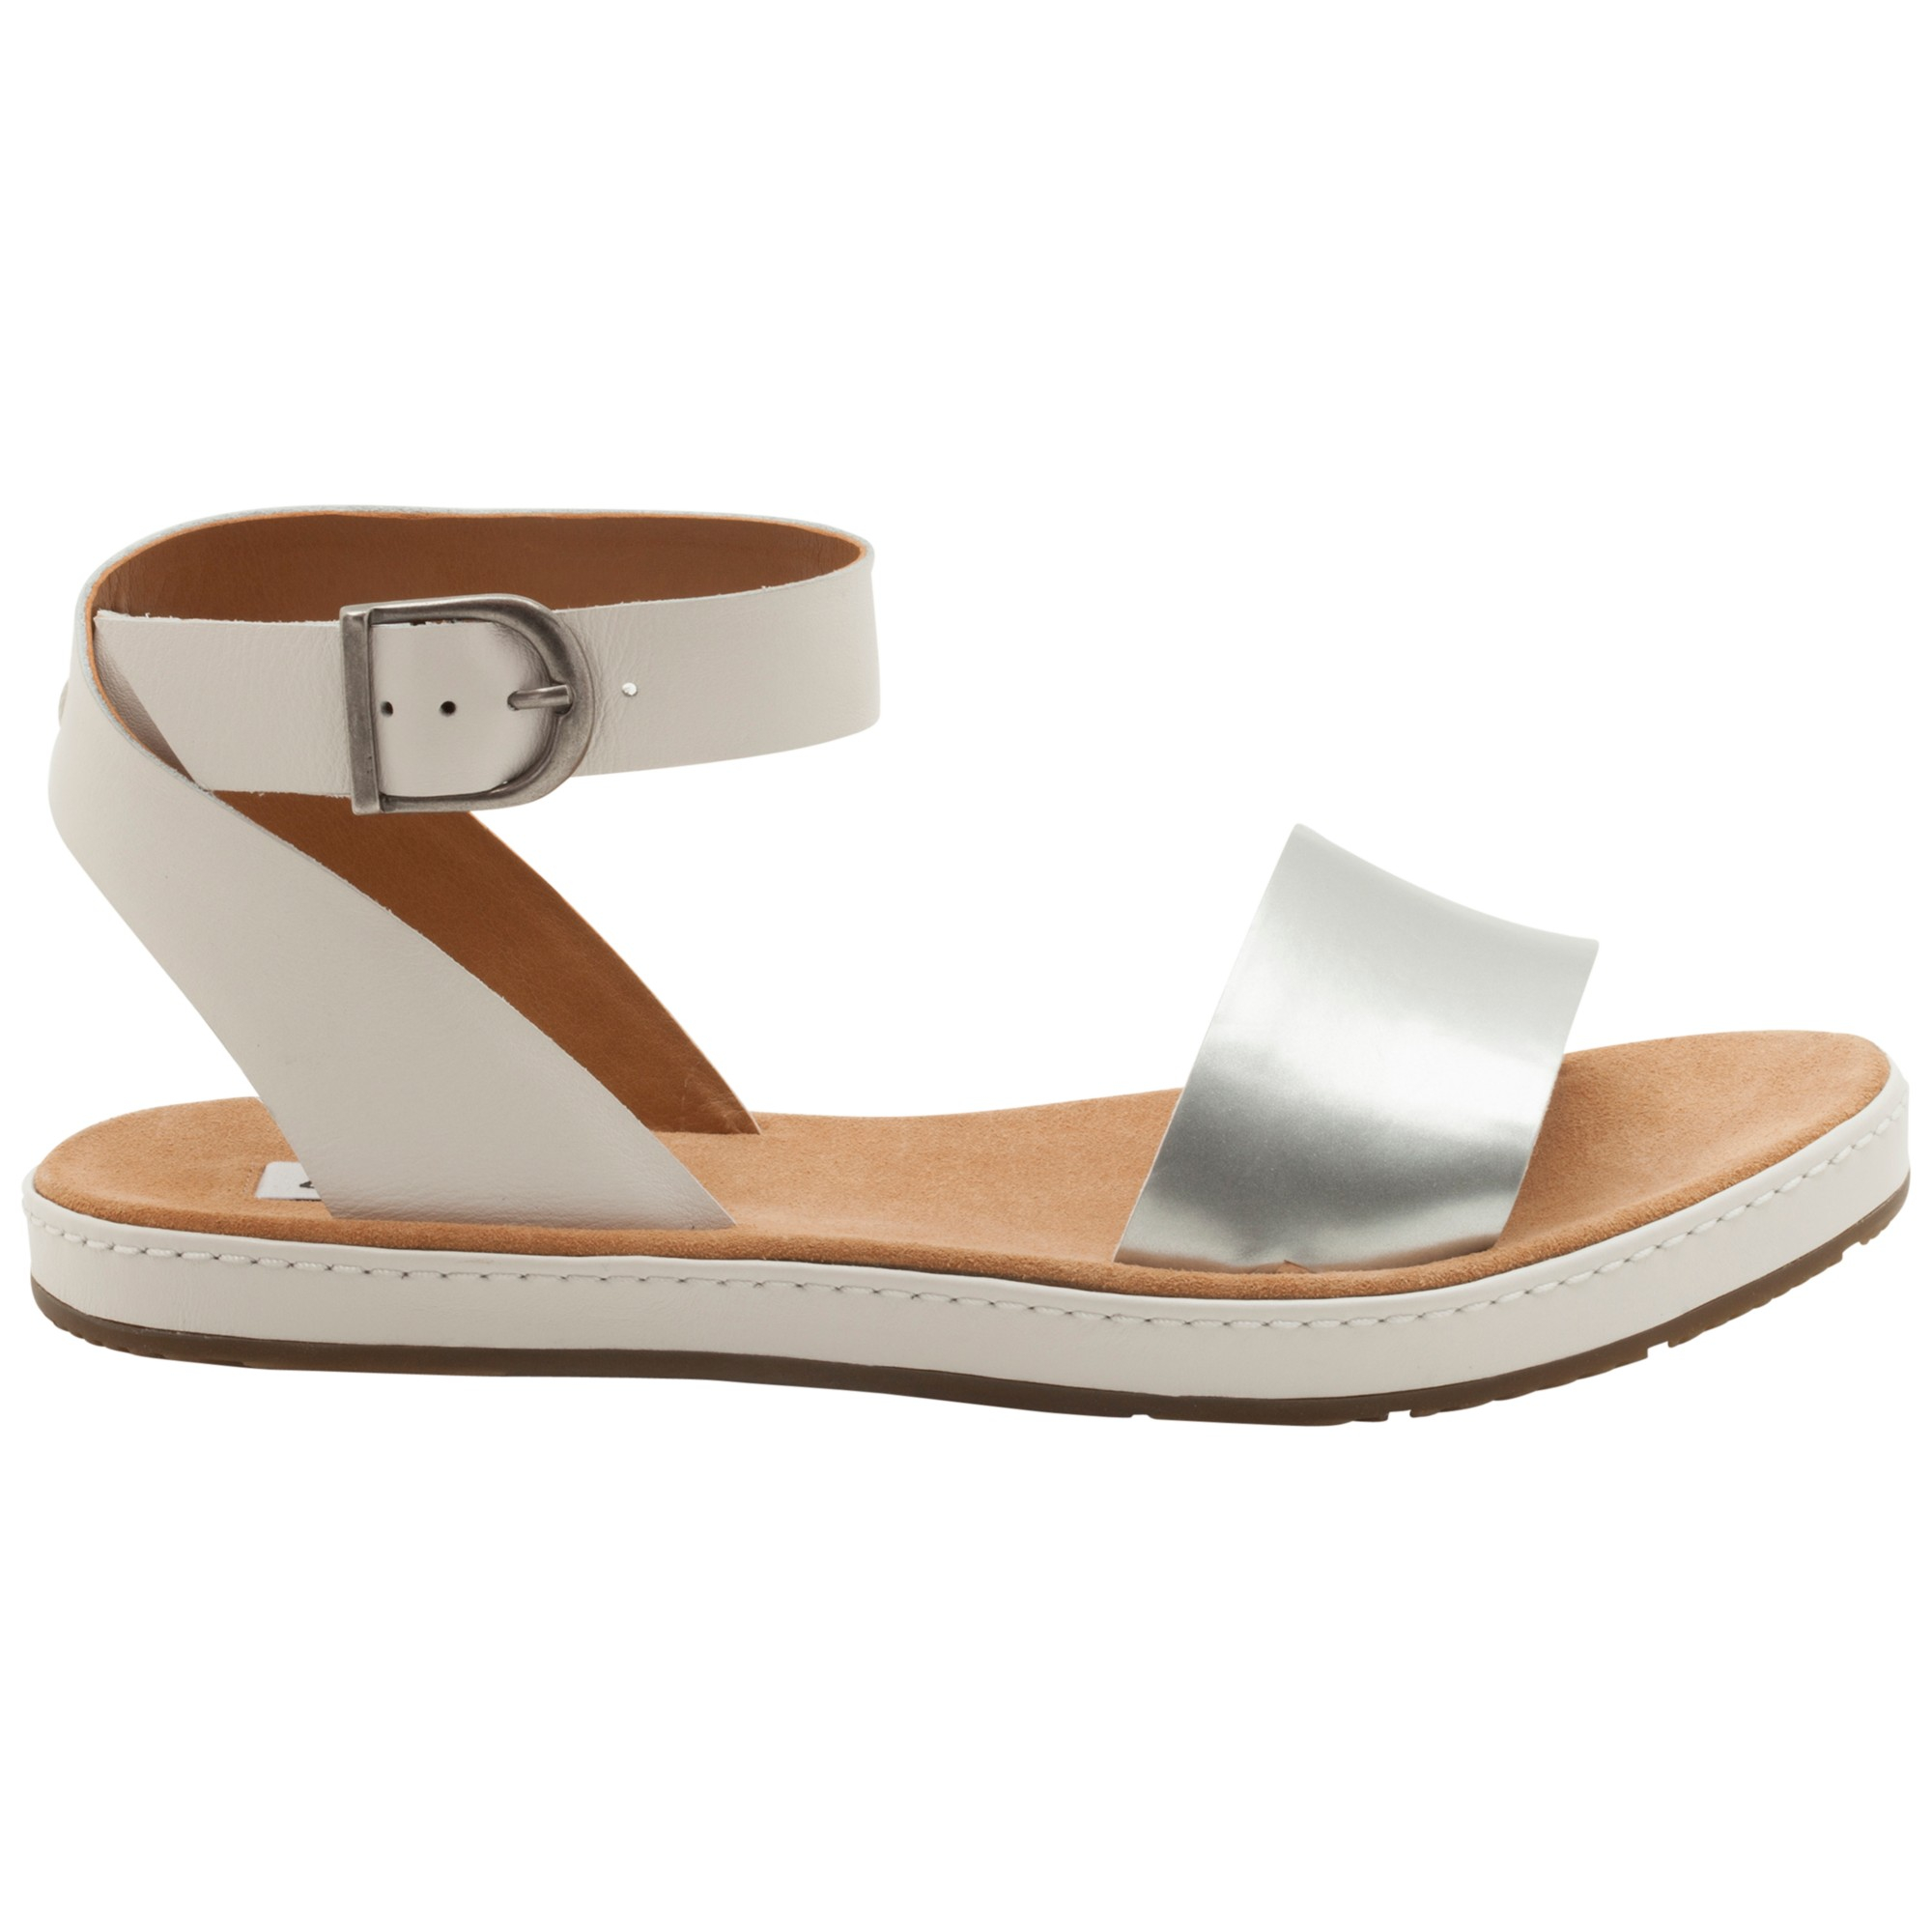 b5f705859 Clarks Romantic Moon Leather Flat Sandals in Metallic - Lyst